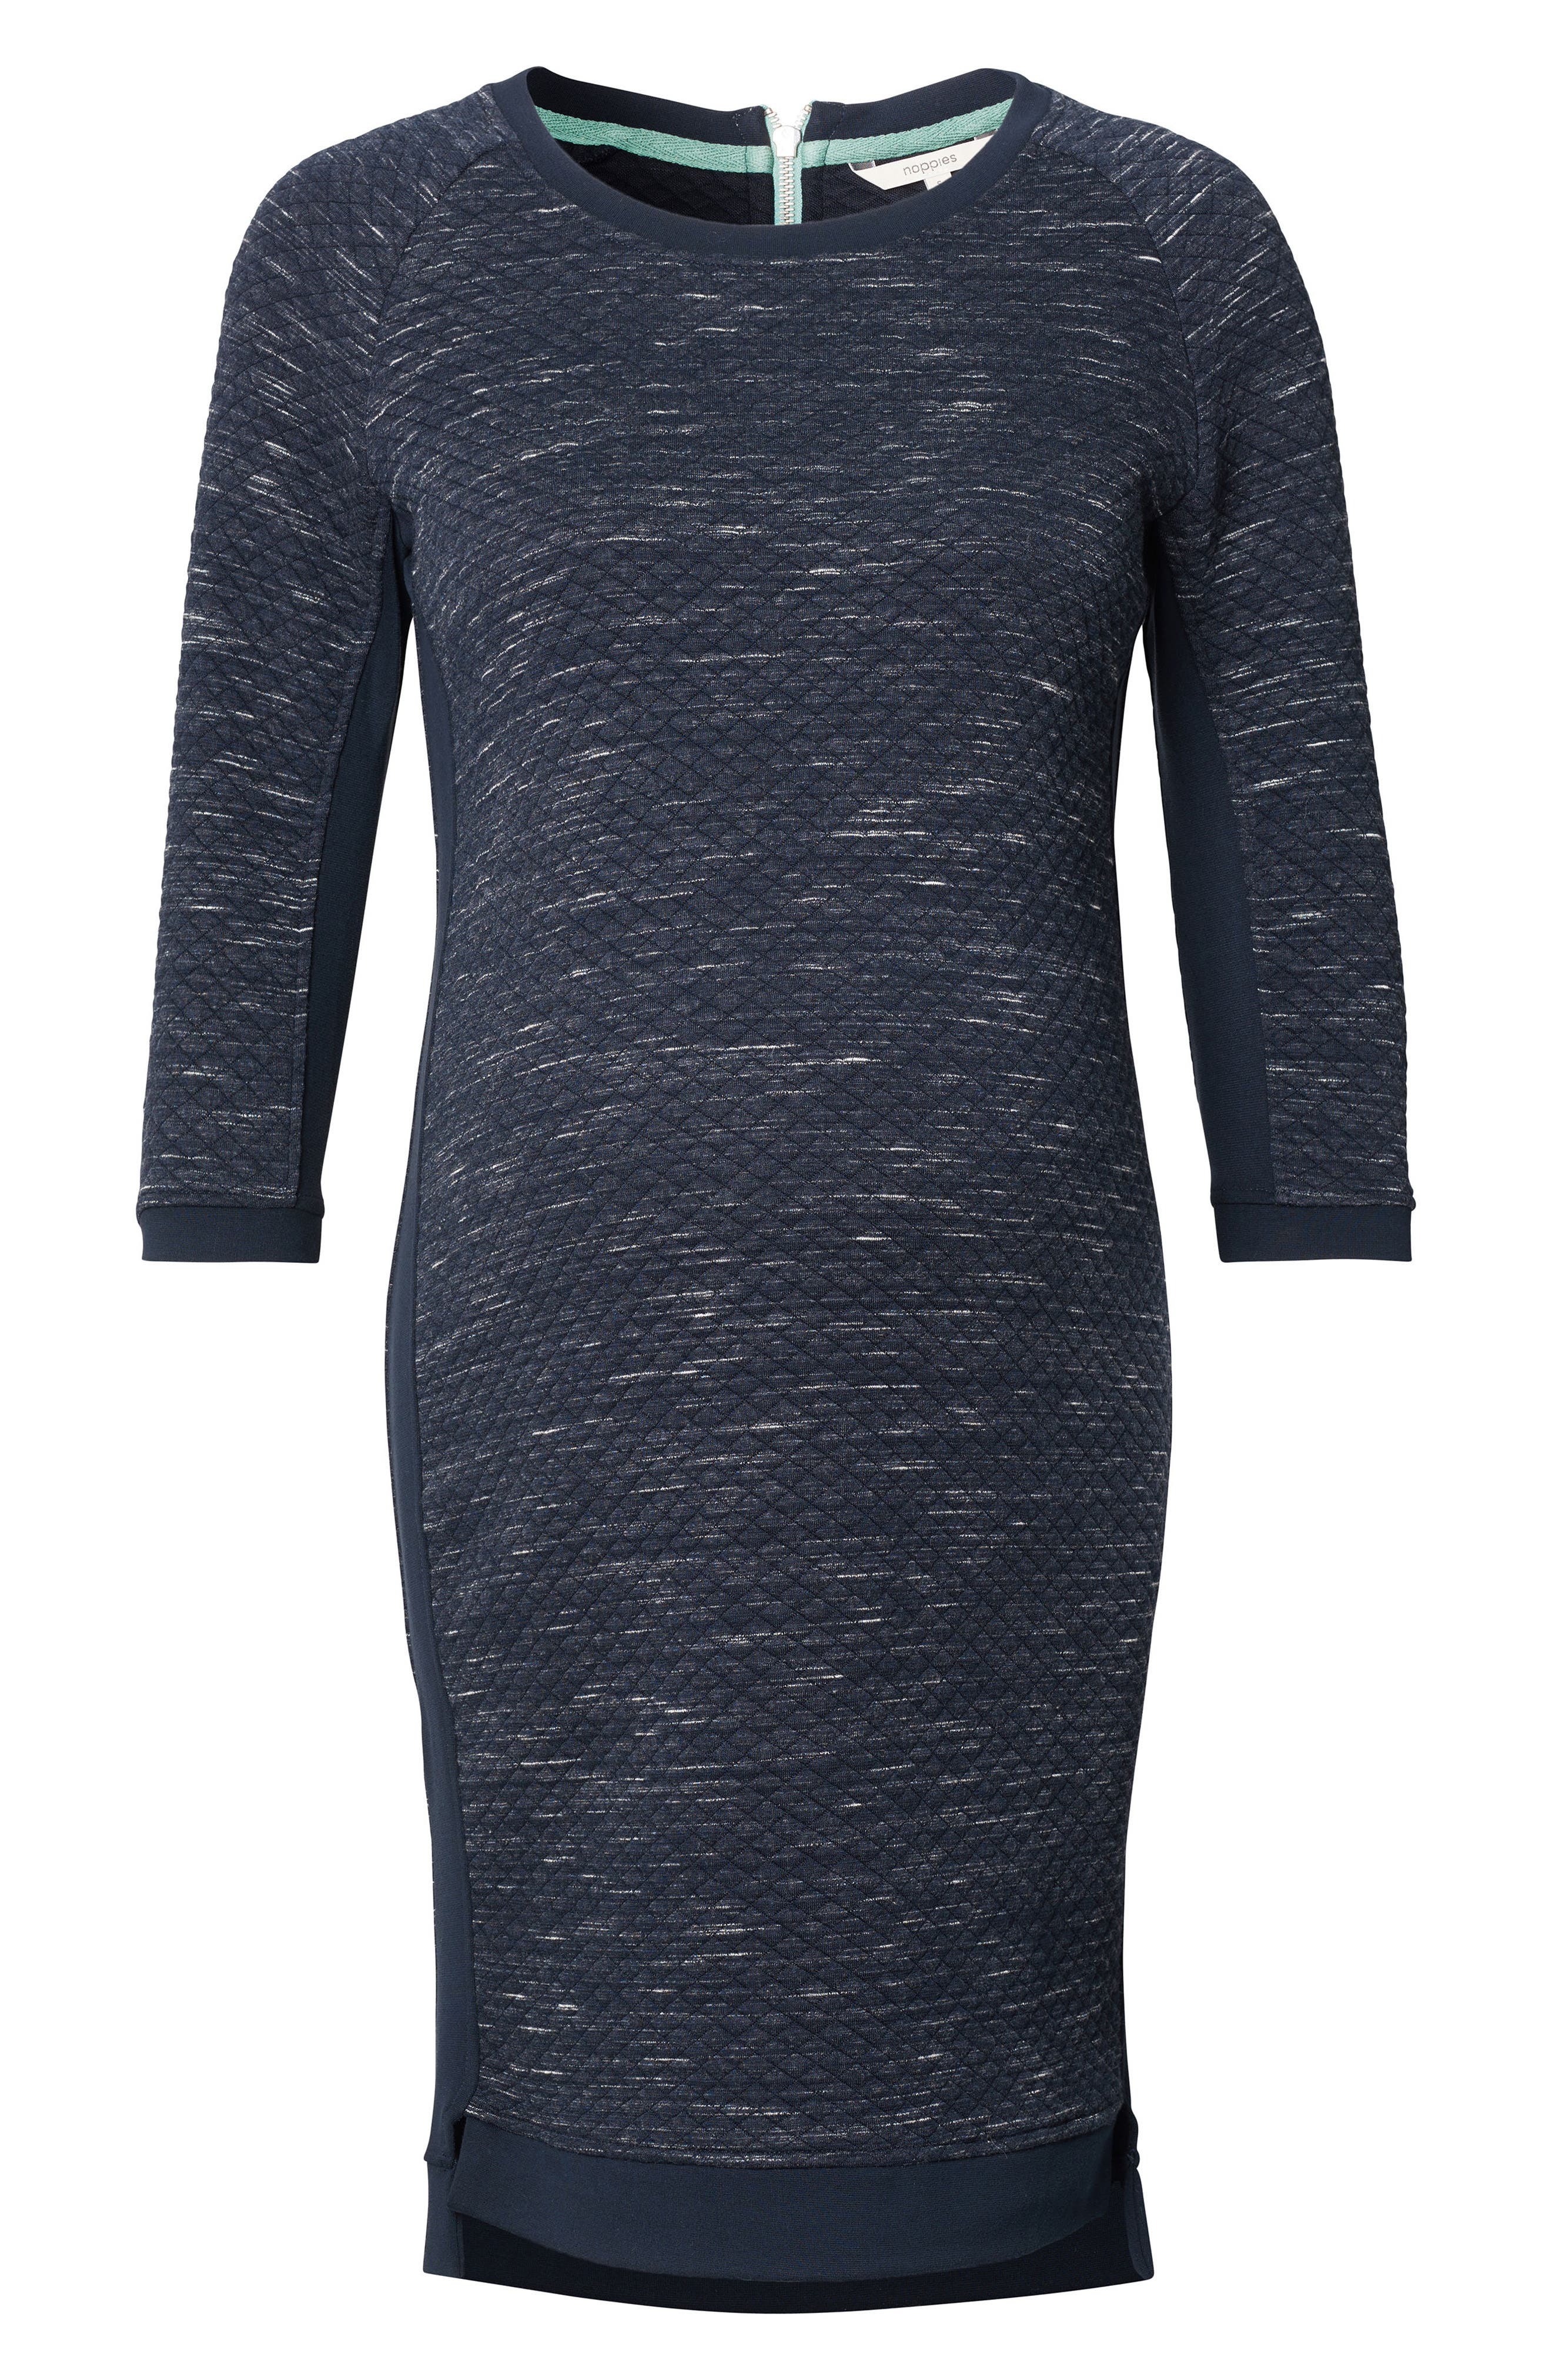 Alternate Image 1 Selected - Noppies Gemma Maternity Sweater Dress